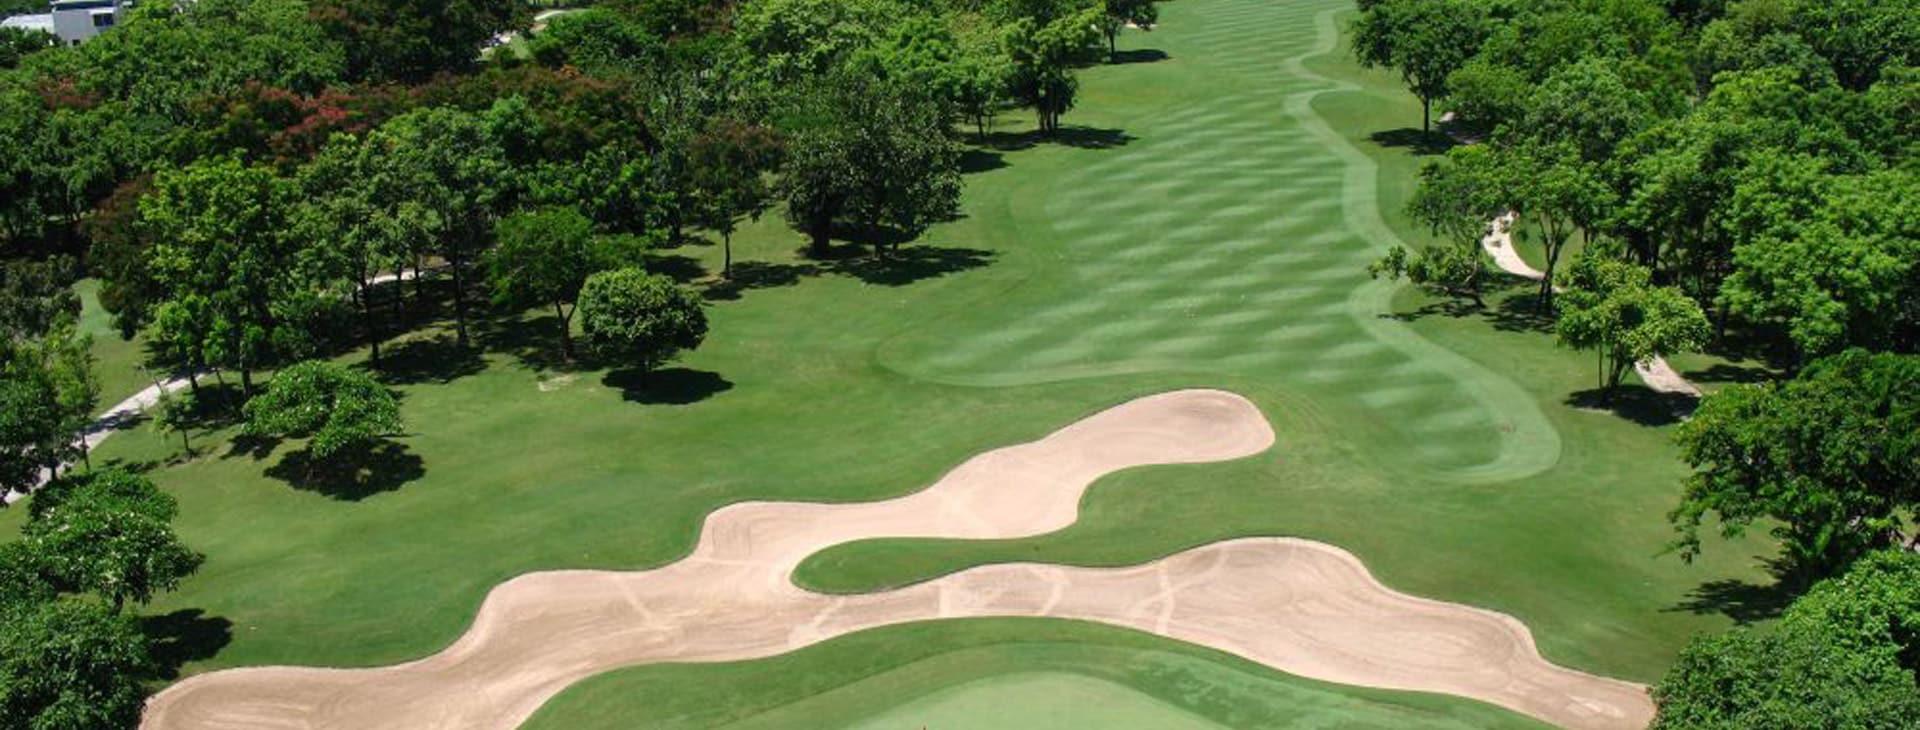 Golf Thailand_Golf Courses_Bangkok_Royal Gems Golf and Sports Club